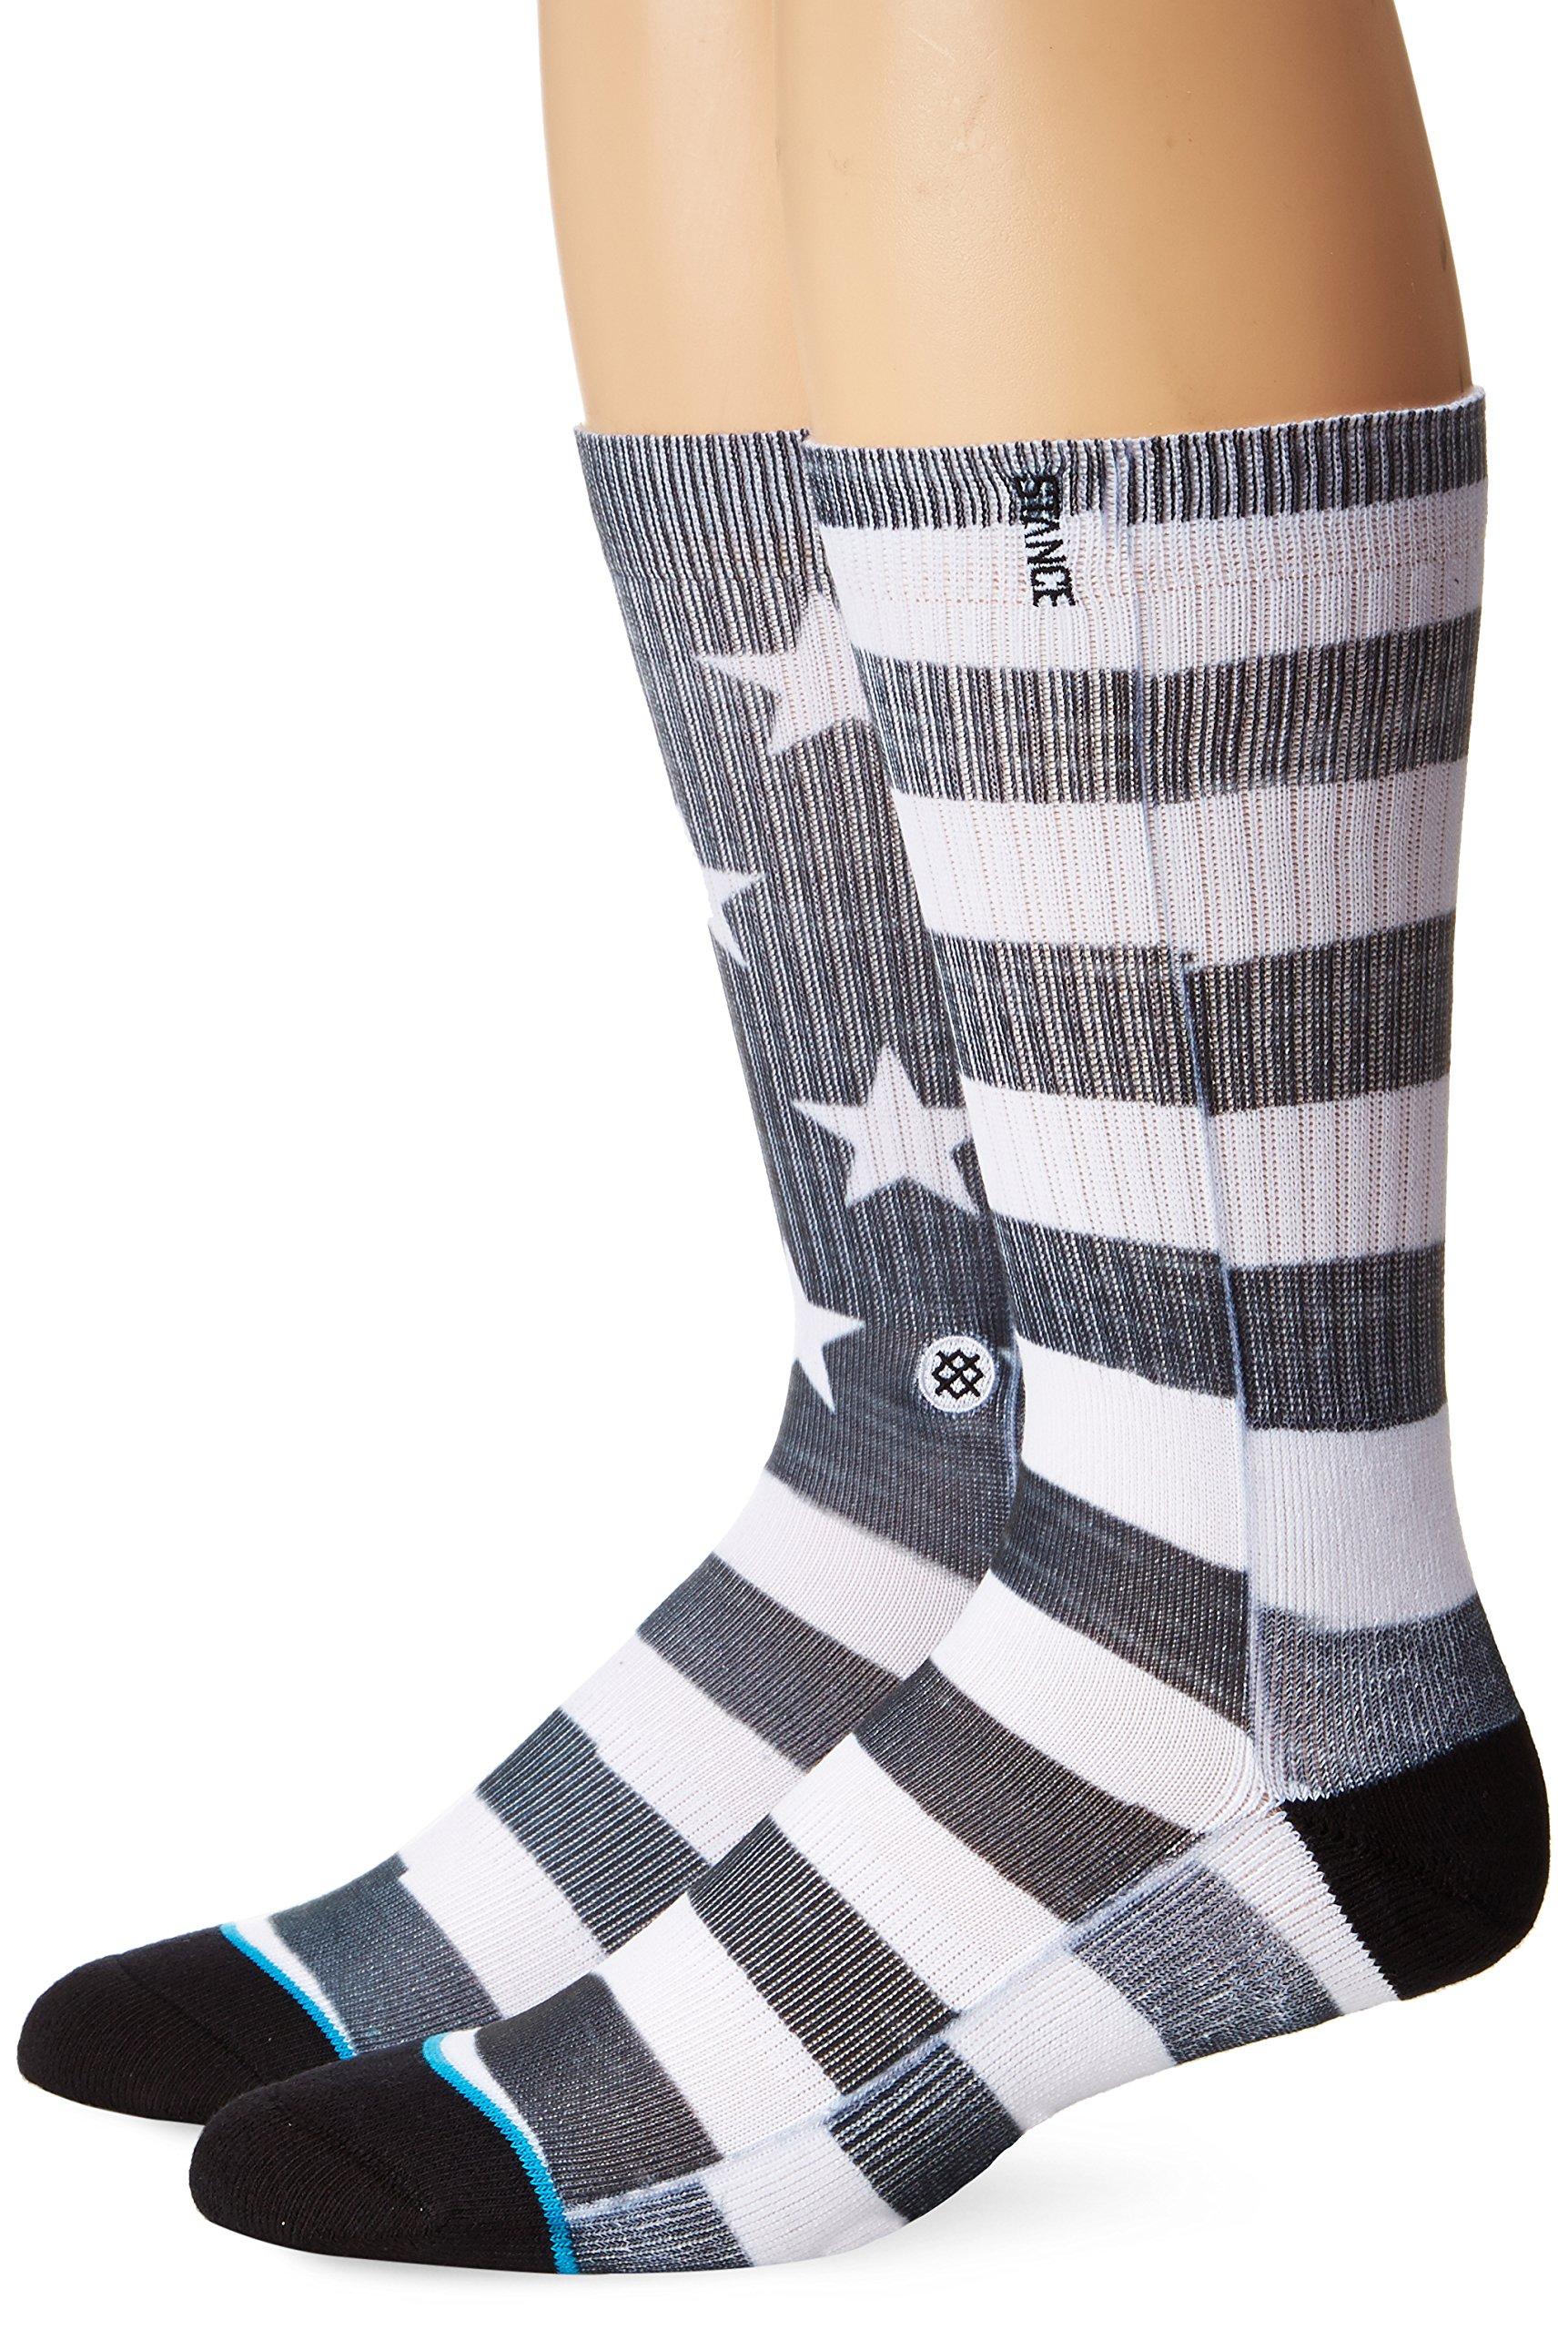 Stance Men's Cano Crew Sock